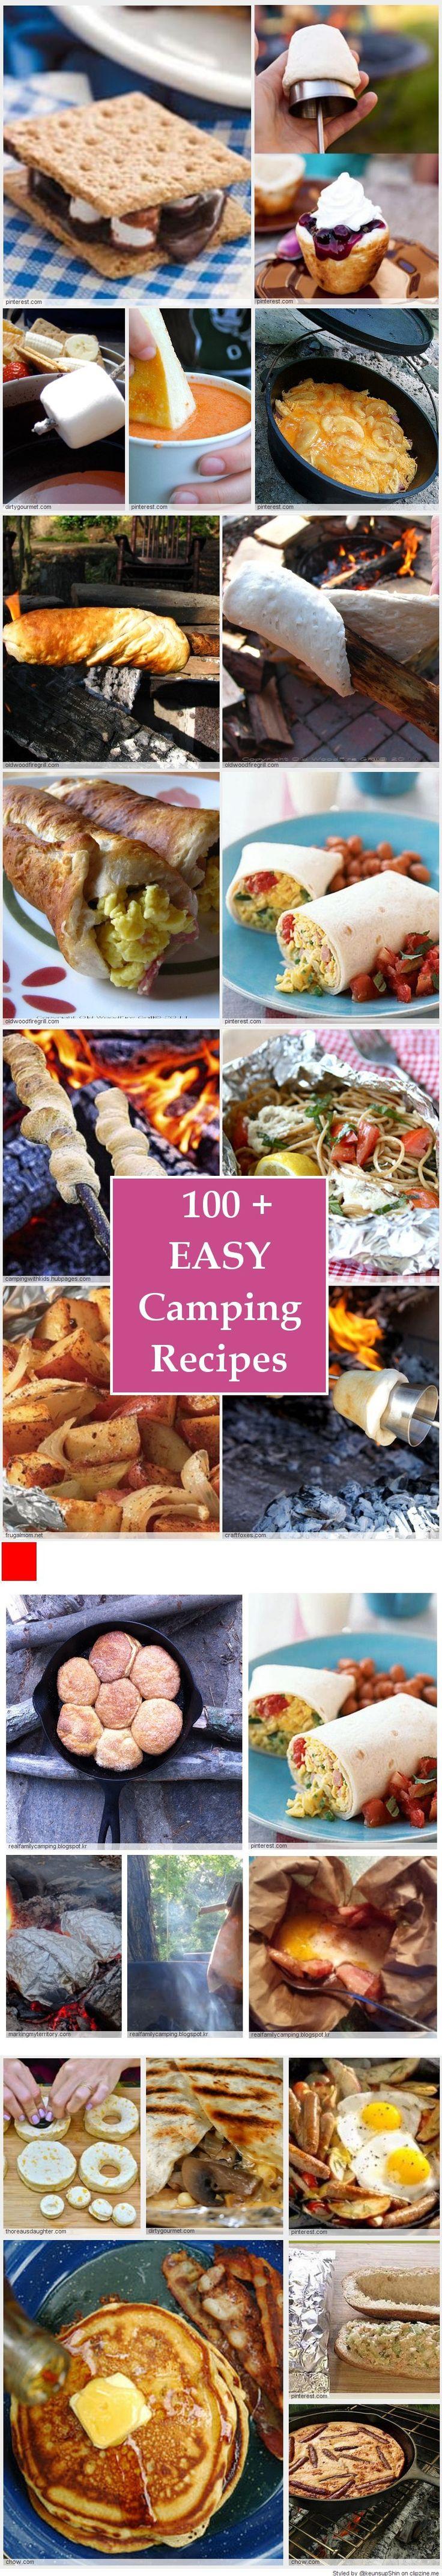 EASY Camping Recipes